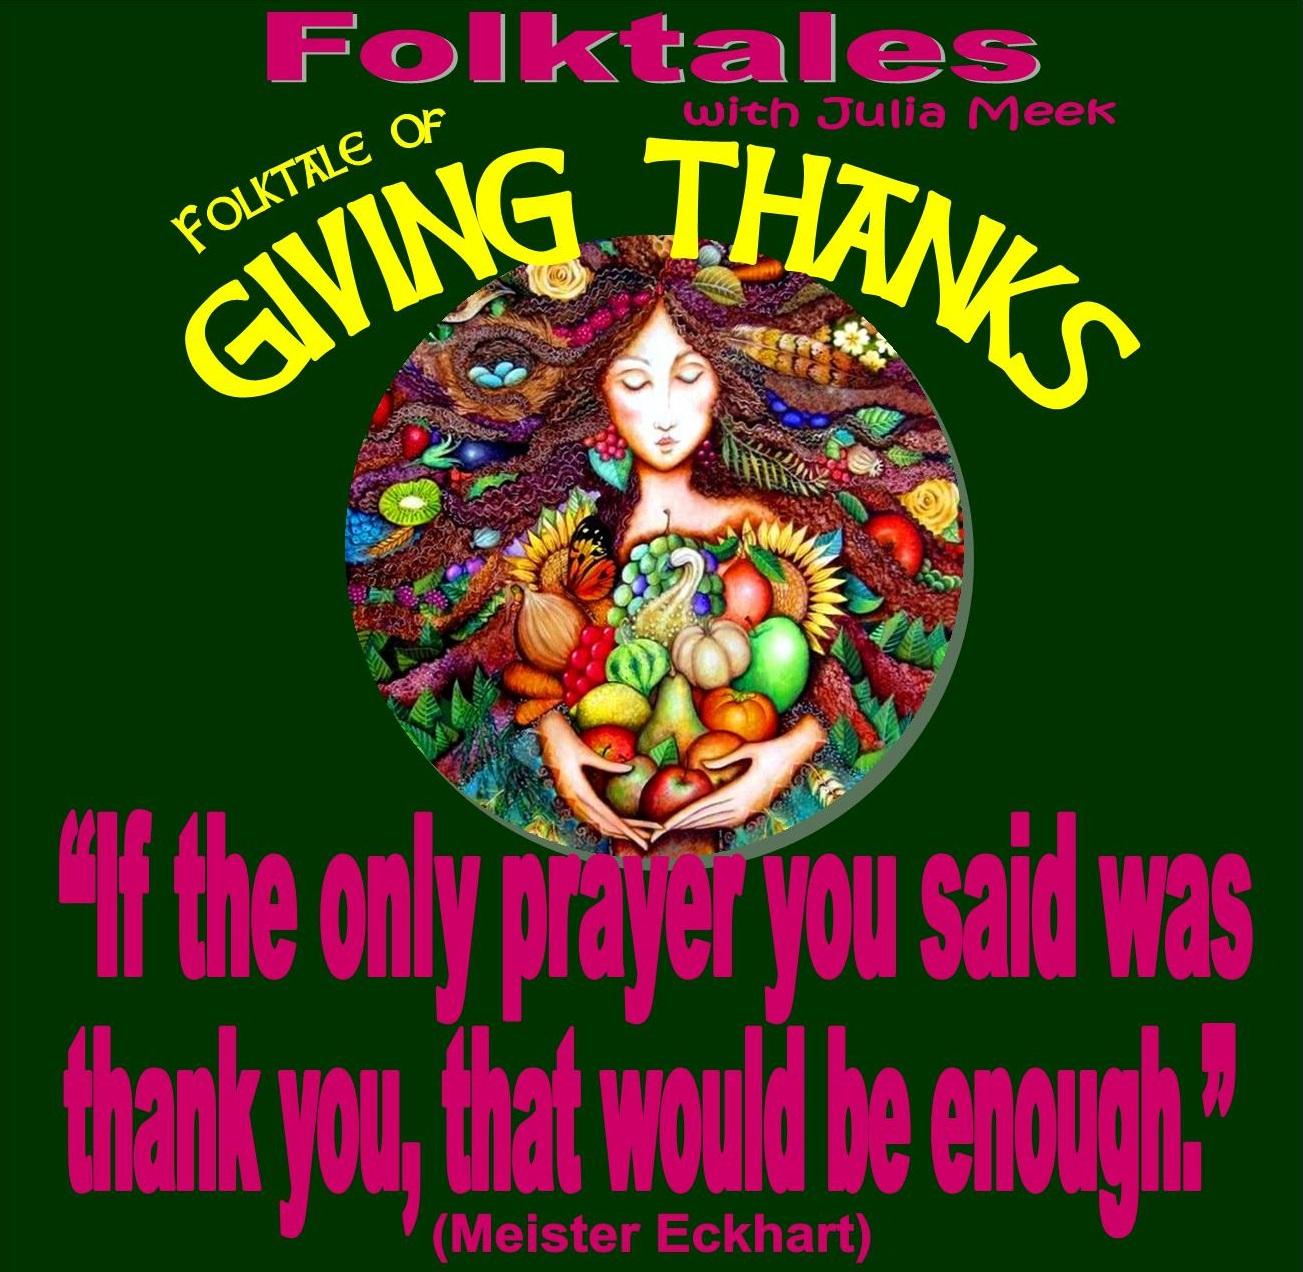 Caption: WBOI's Folktale of Giving Thanks, Credit: Julia Meek